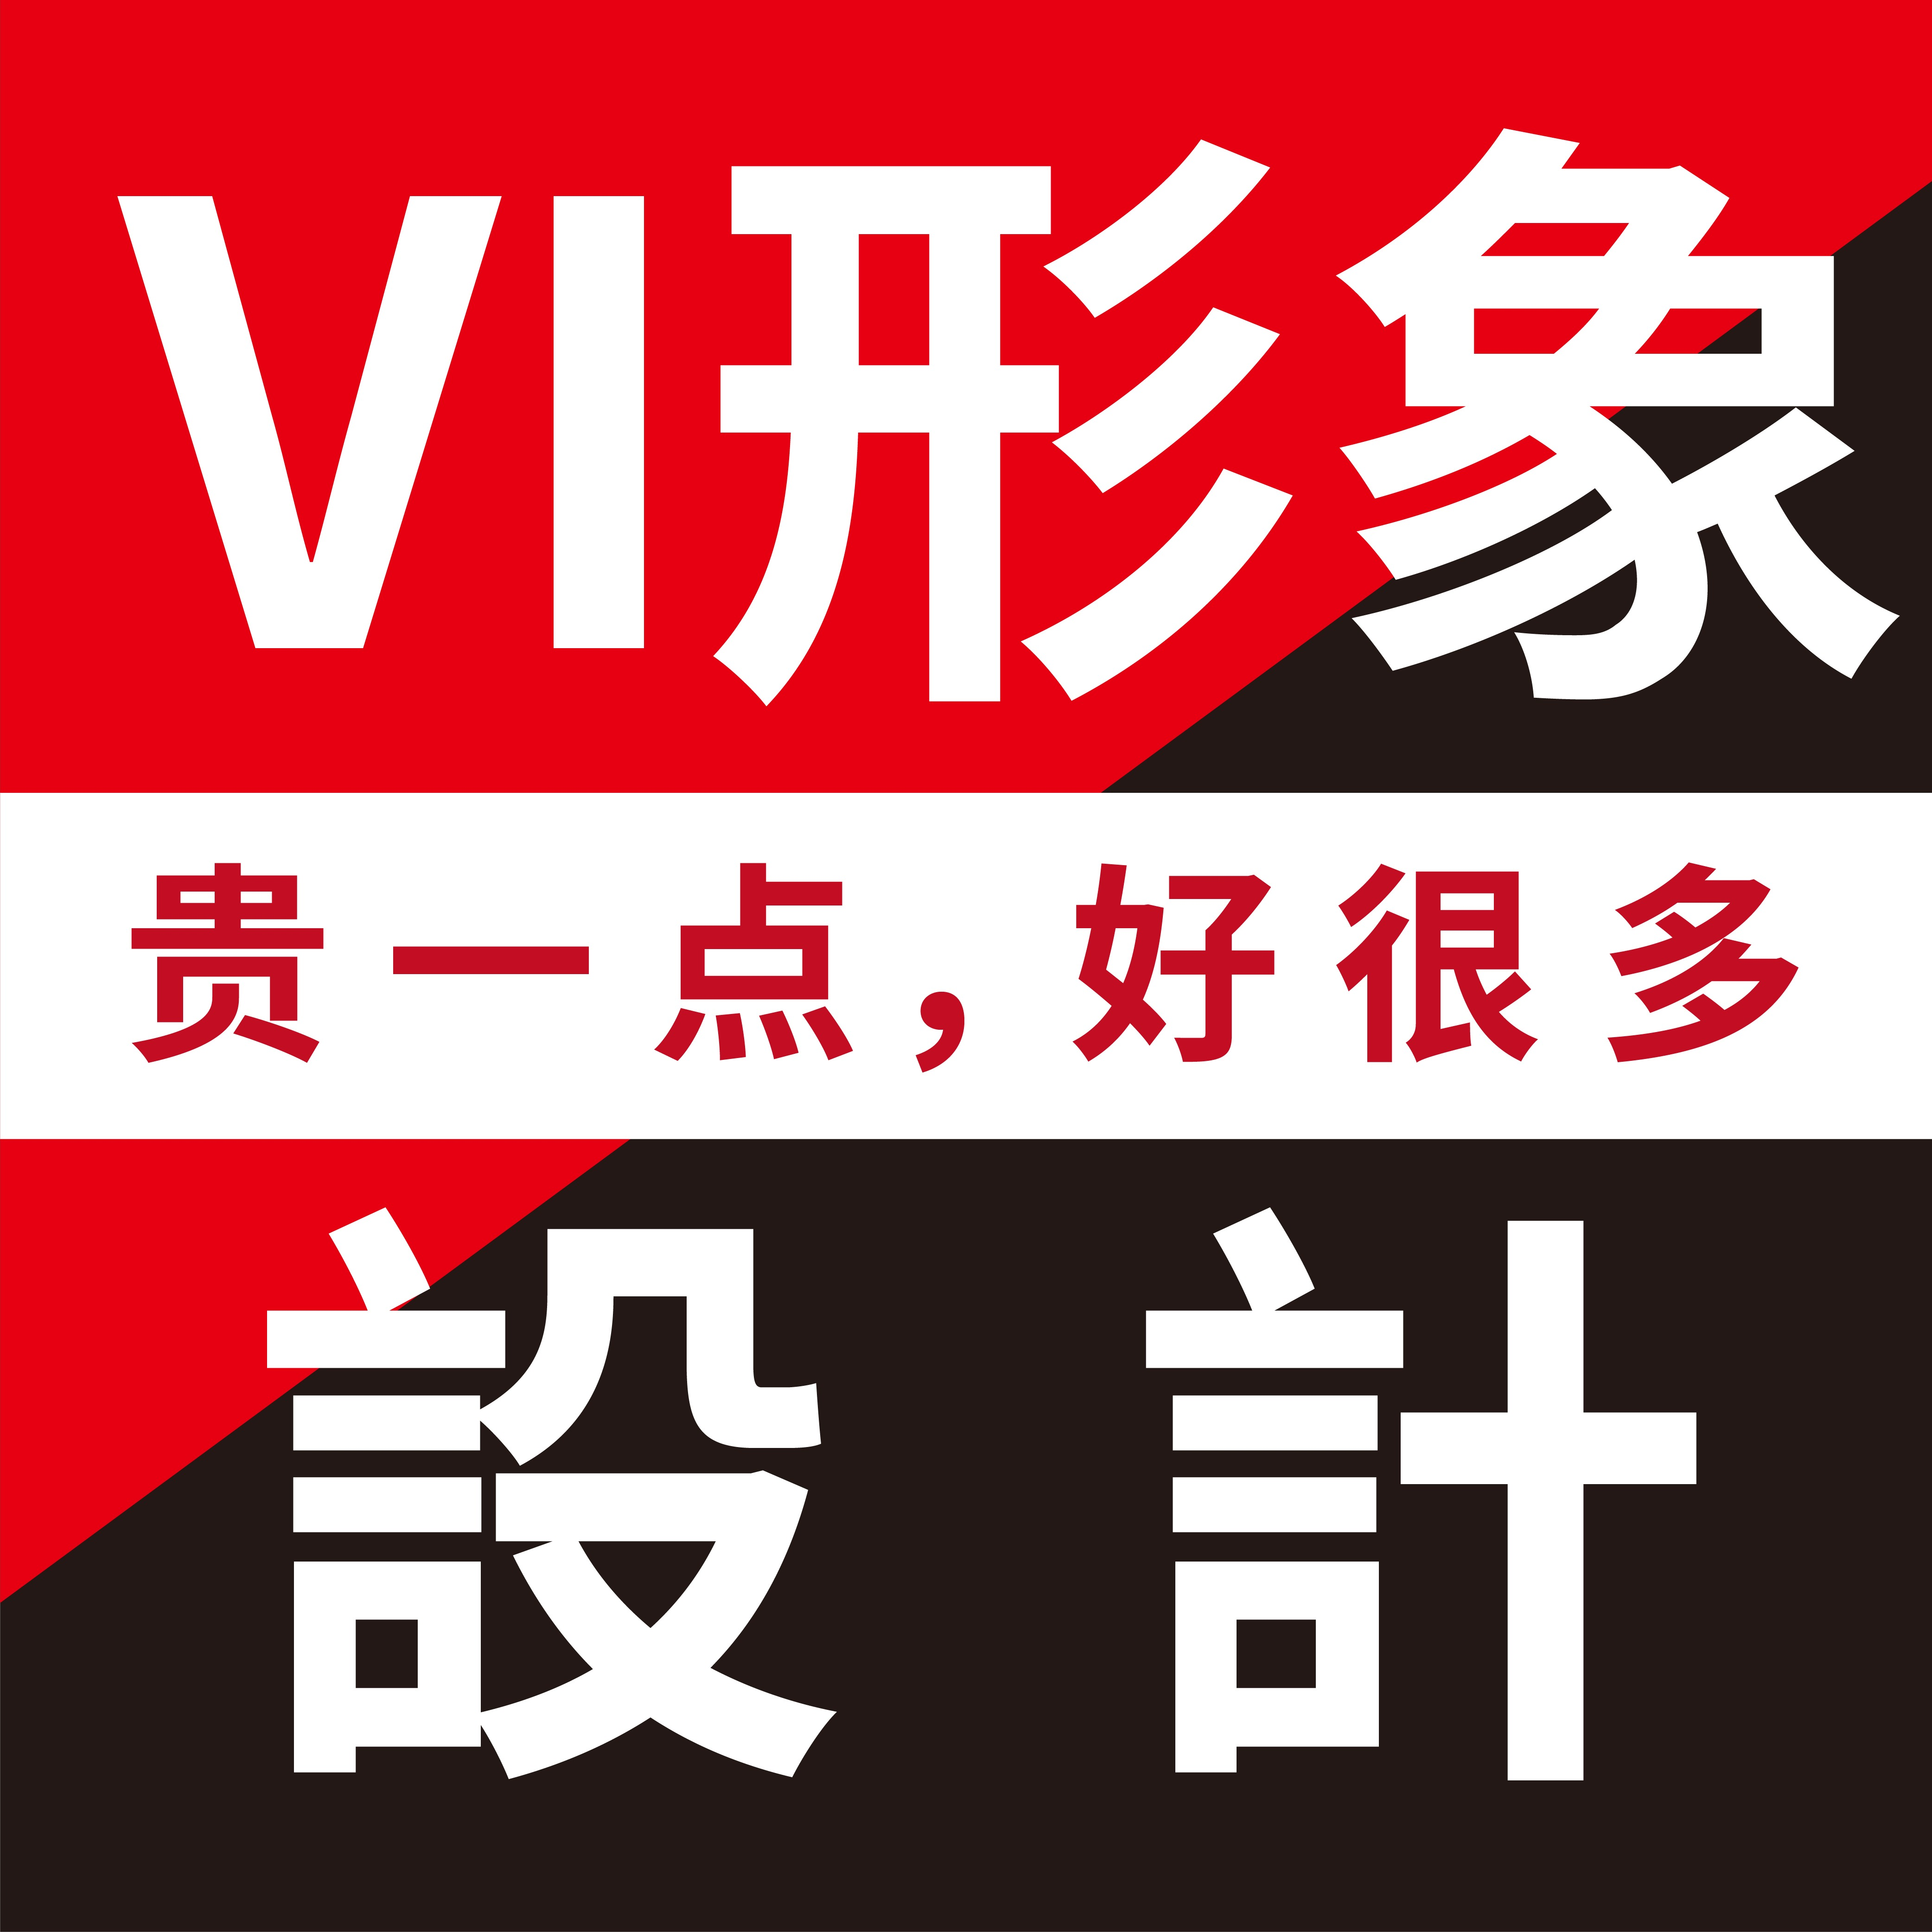 VI品牌设计VI企业形象VI餐饮设计VI地产设计创业基础版